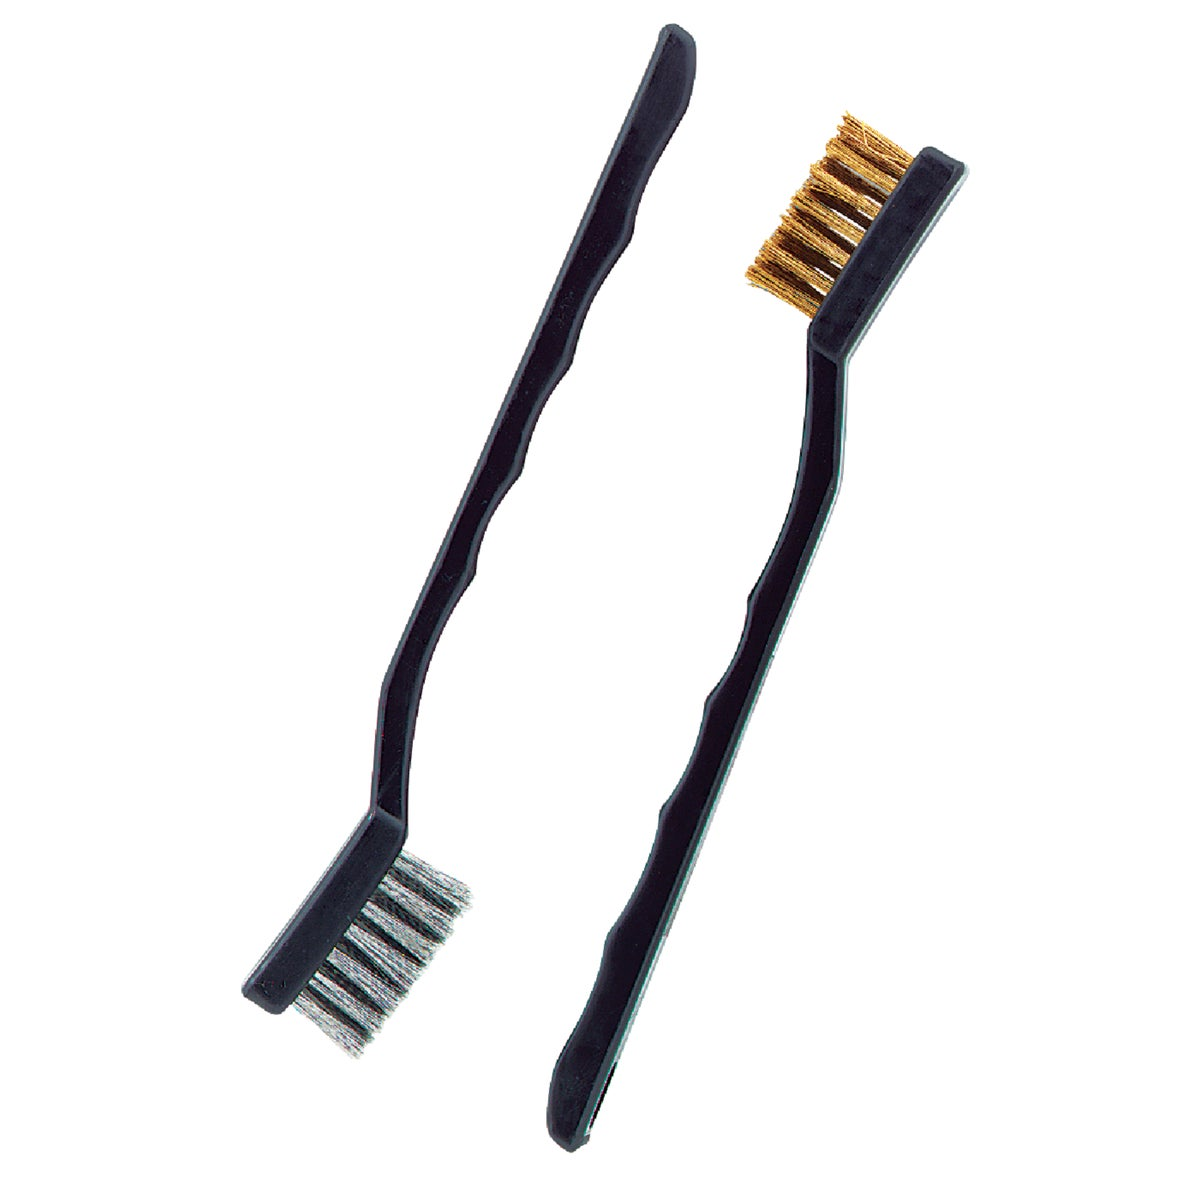 2Pk Utility Brush